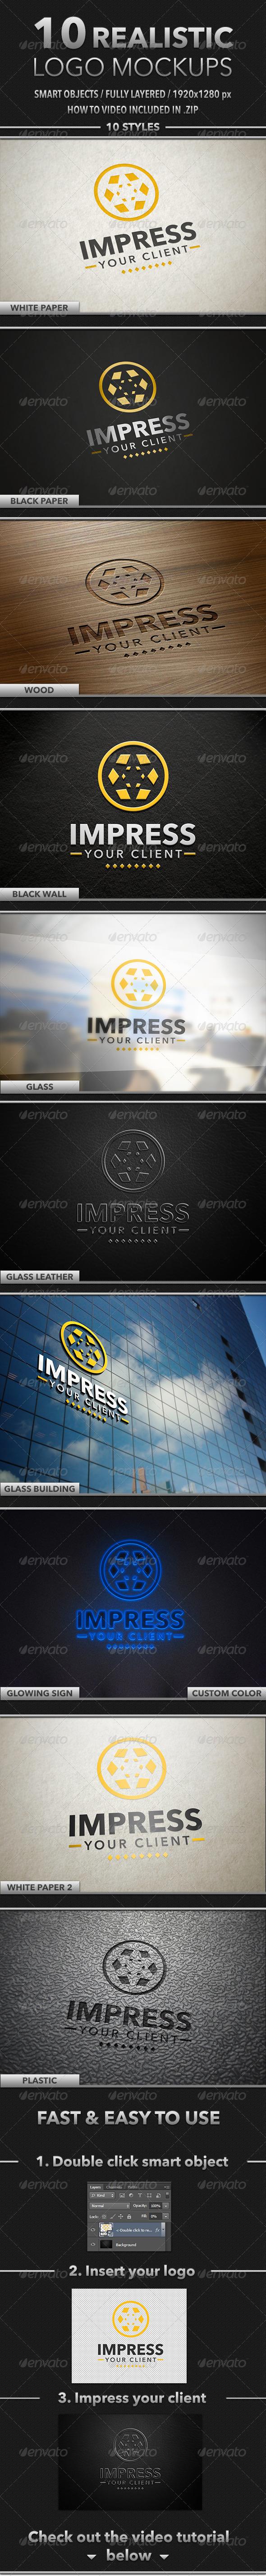 GraphicRiver 10 Realistic Logo Mockups 4486983